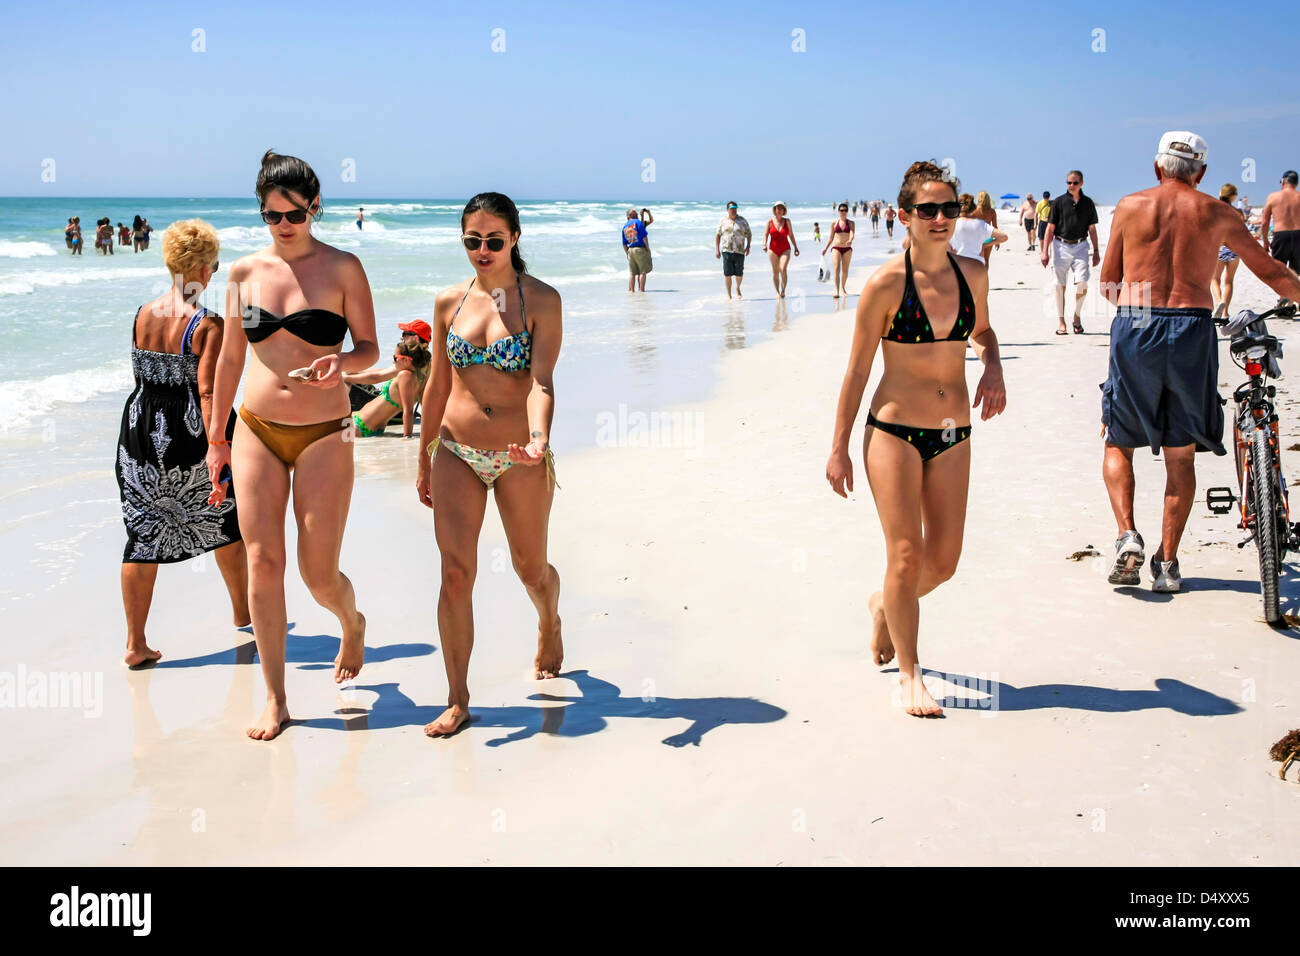 College girls spring break nude beach